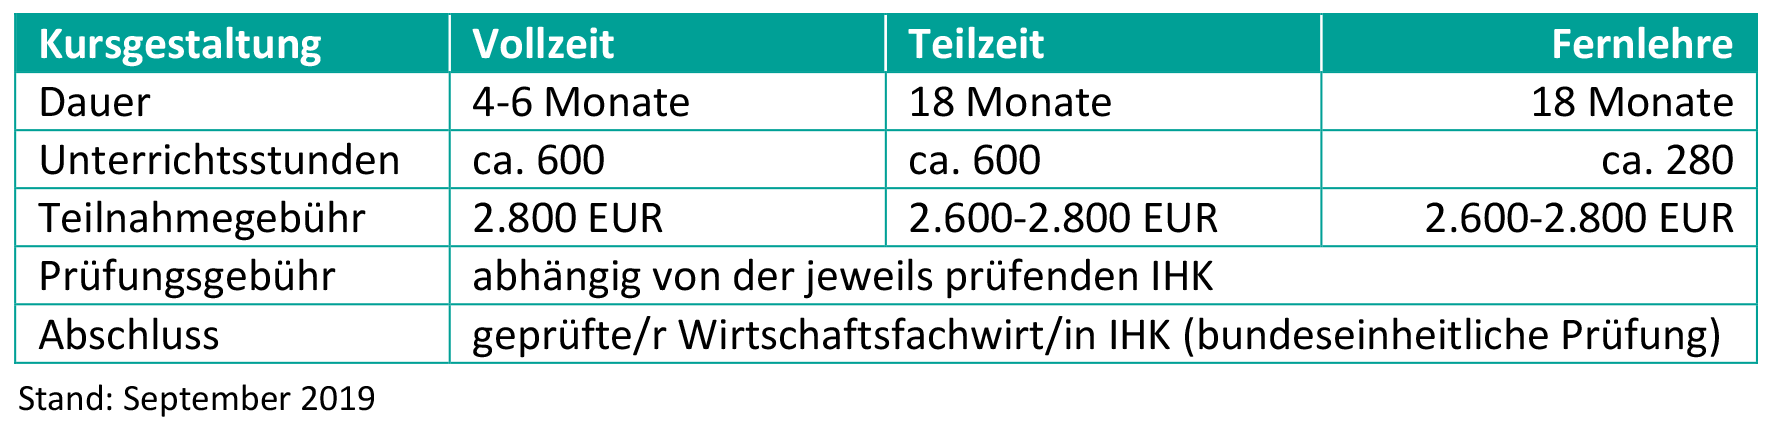 WFW-Eckert-Schulen-Tabelle